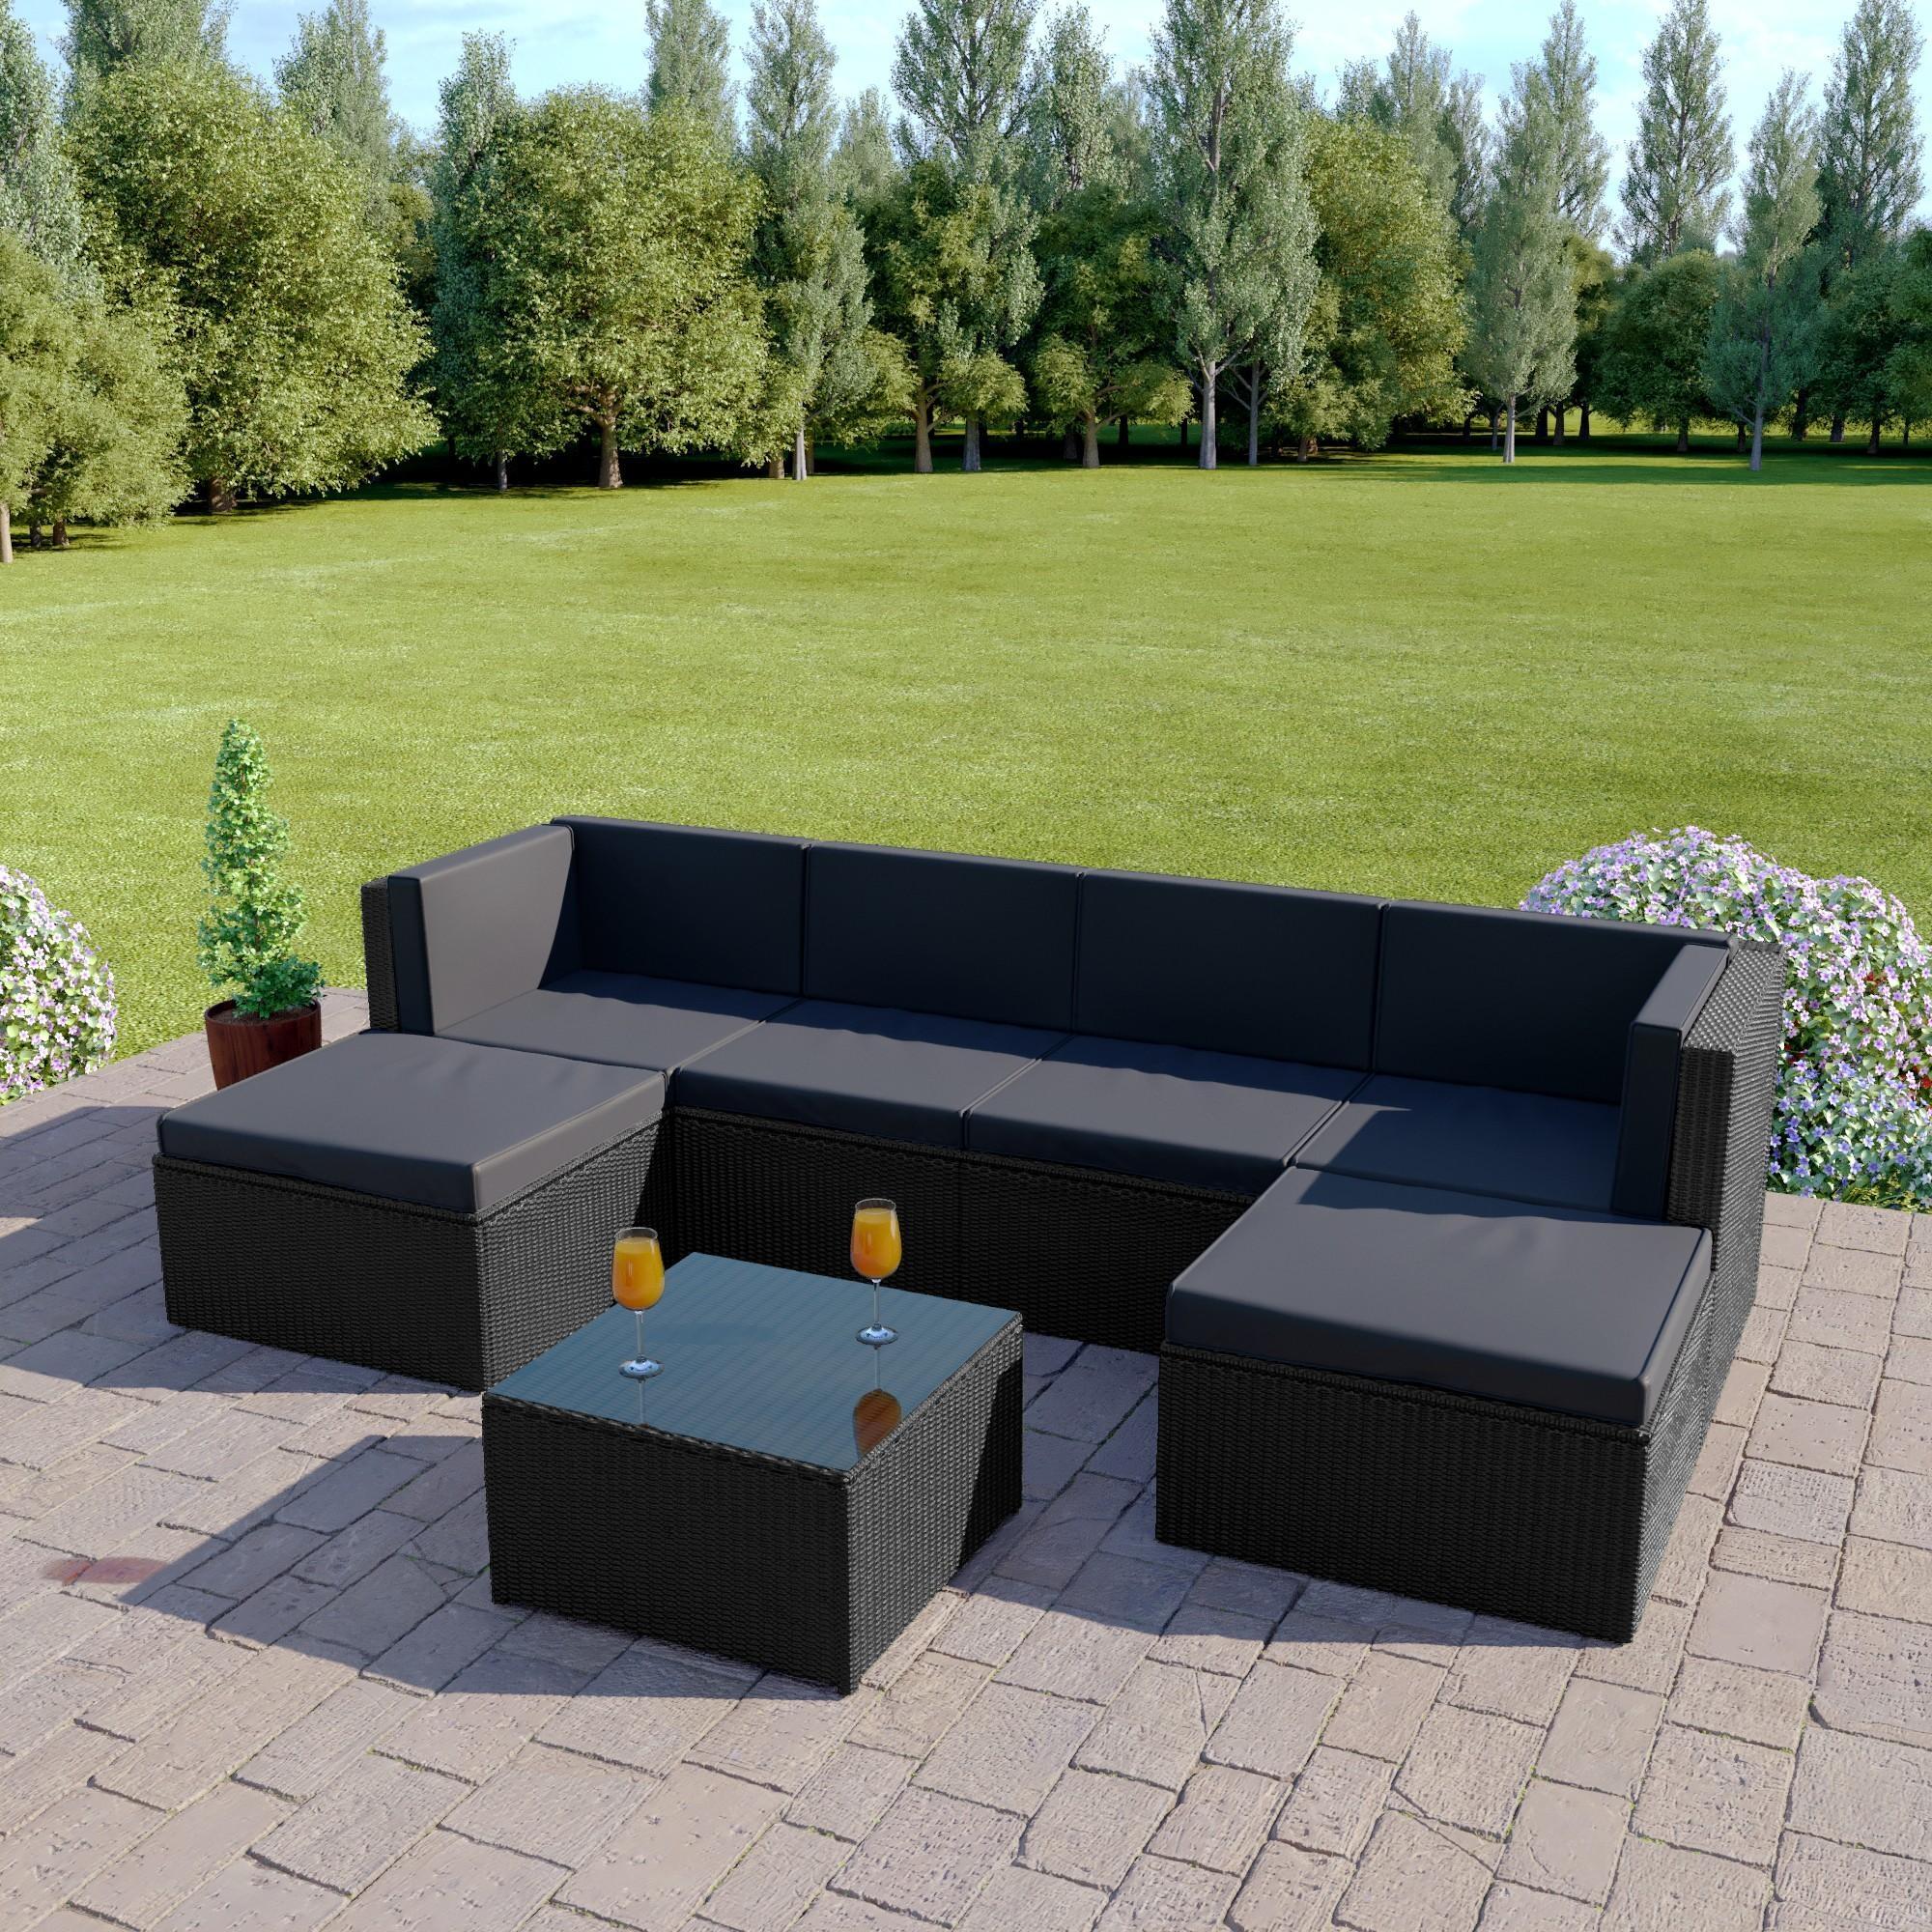 Rattan Corner Sofa Sets | Cheap Outdoor Garden Sets | Rattan Furniture Intended For Black Corner Sofas (View 15 of 20)